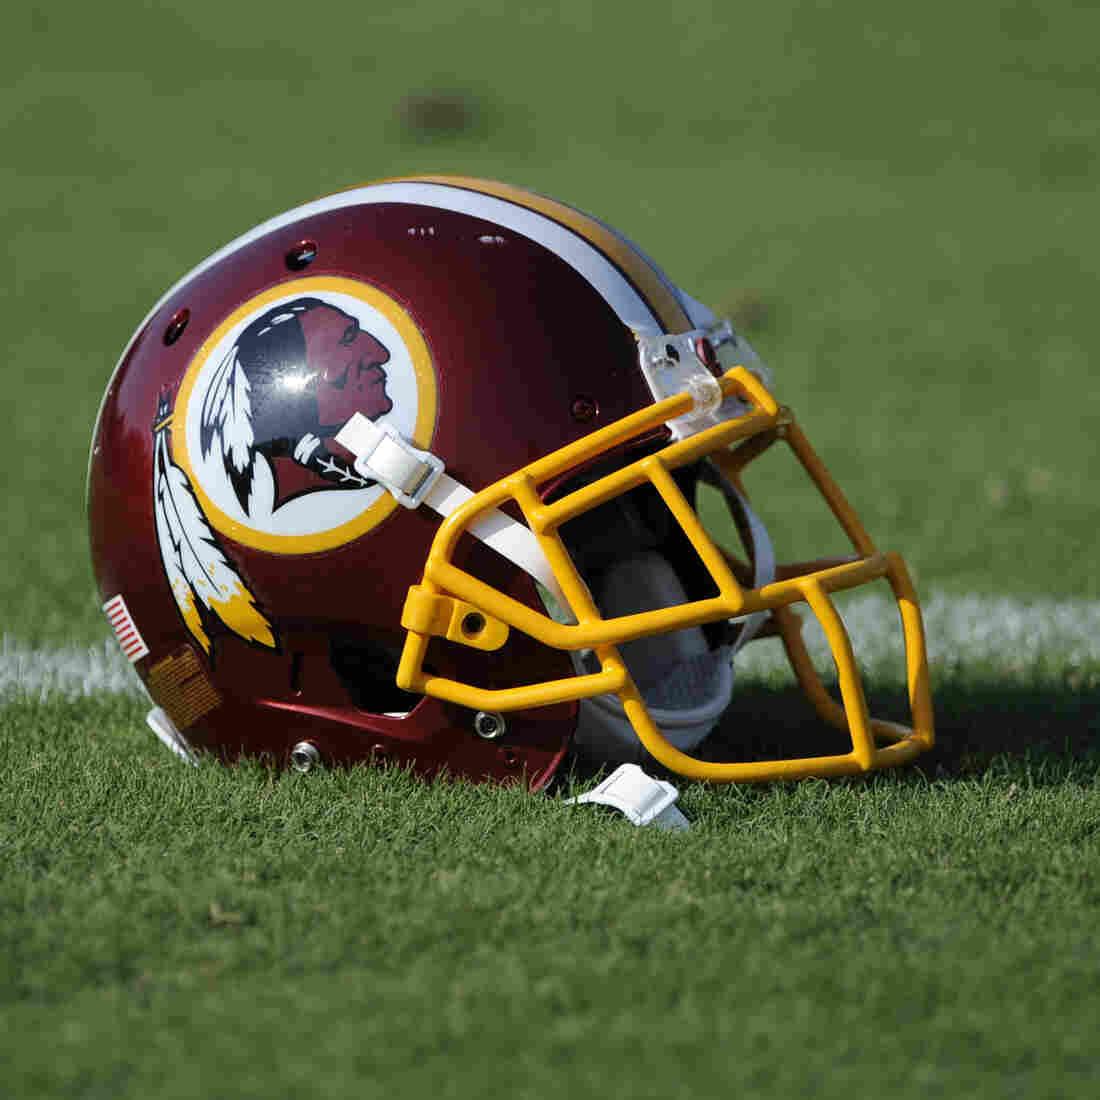 Washington Redskins' Trademark Registrations Cancelled